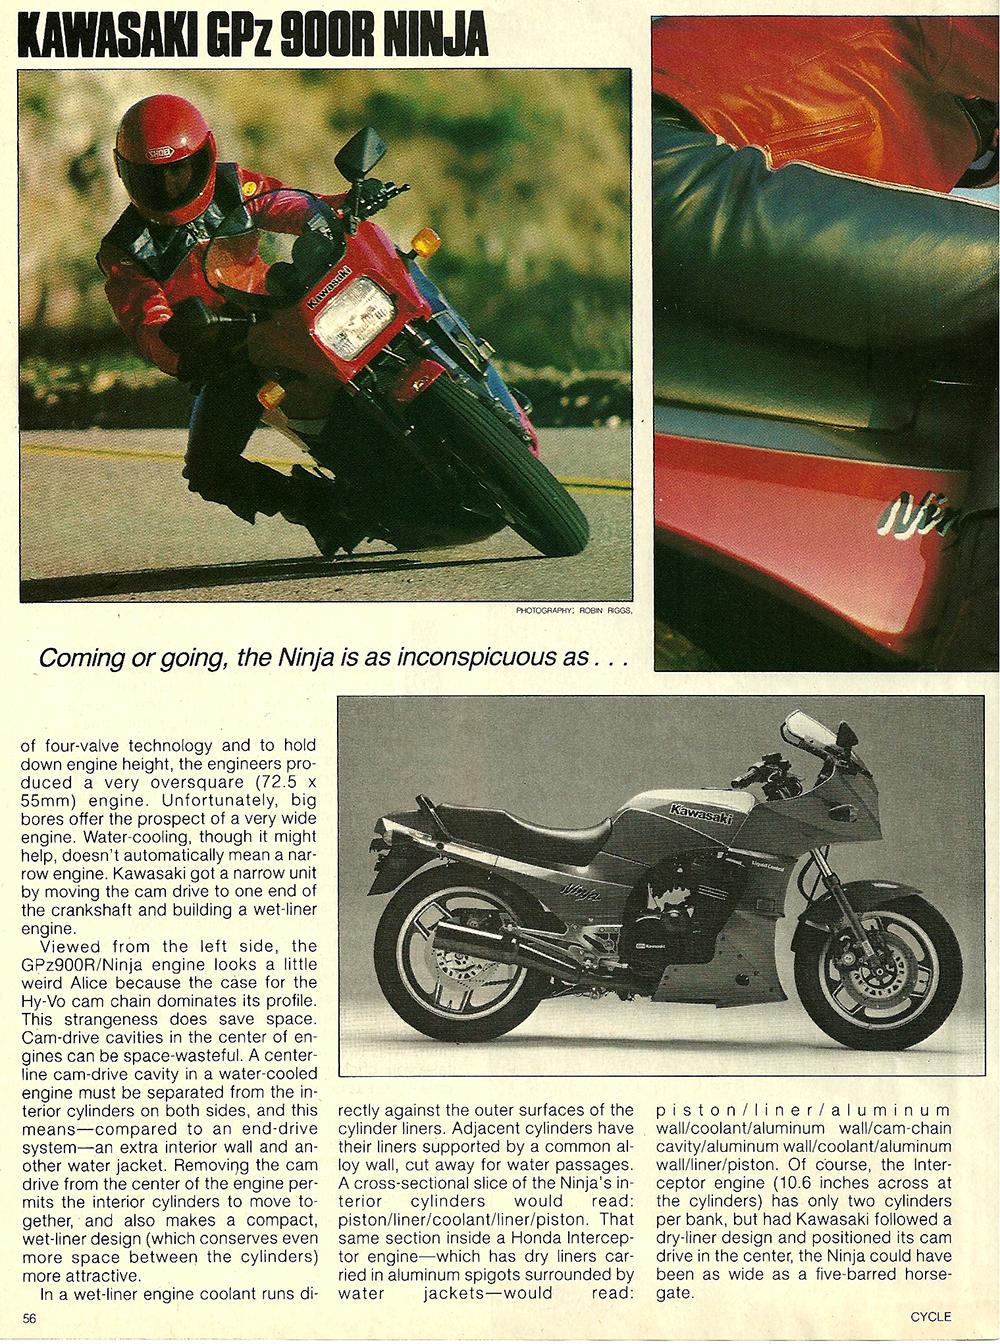 1984 Kawasaki GPz 900R Ninja road test 03.jpg